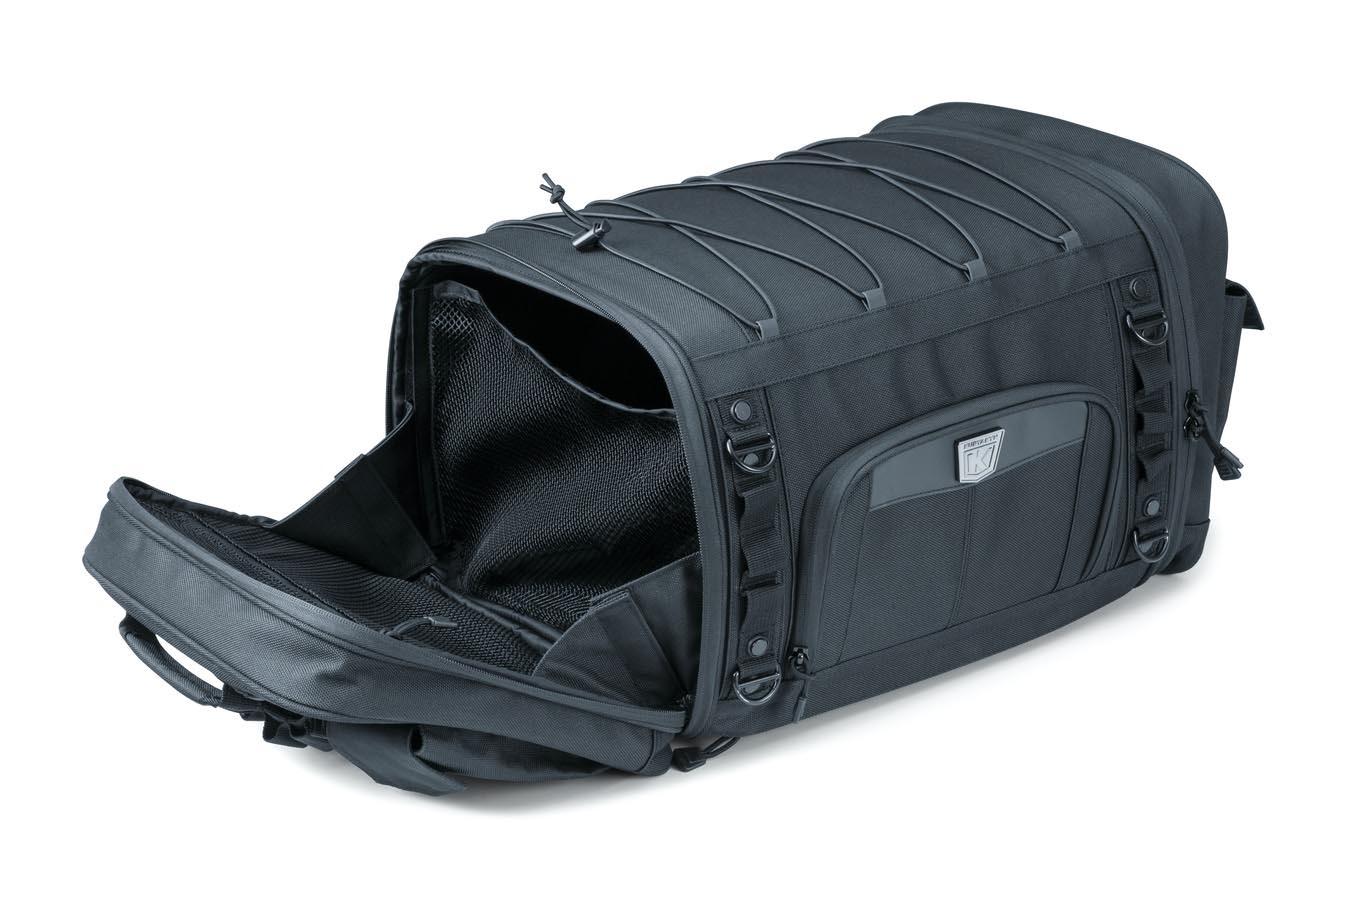 Kuryakyn Momentum Luggage Drifter Bag